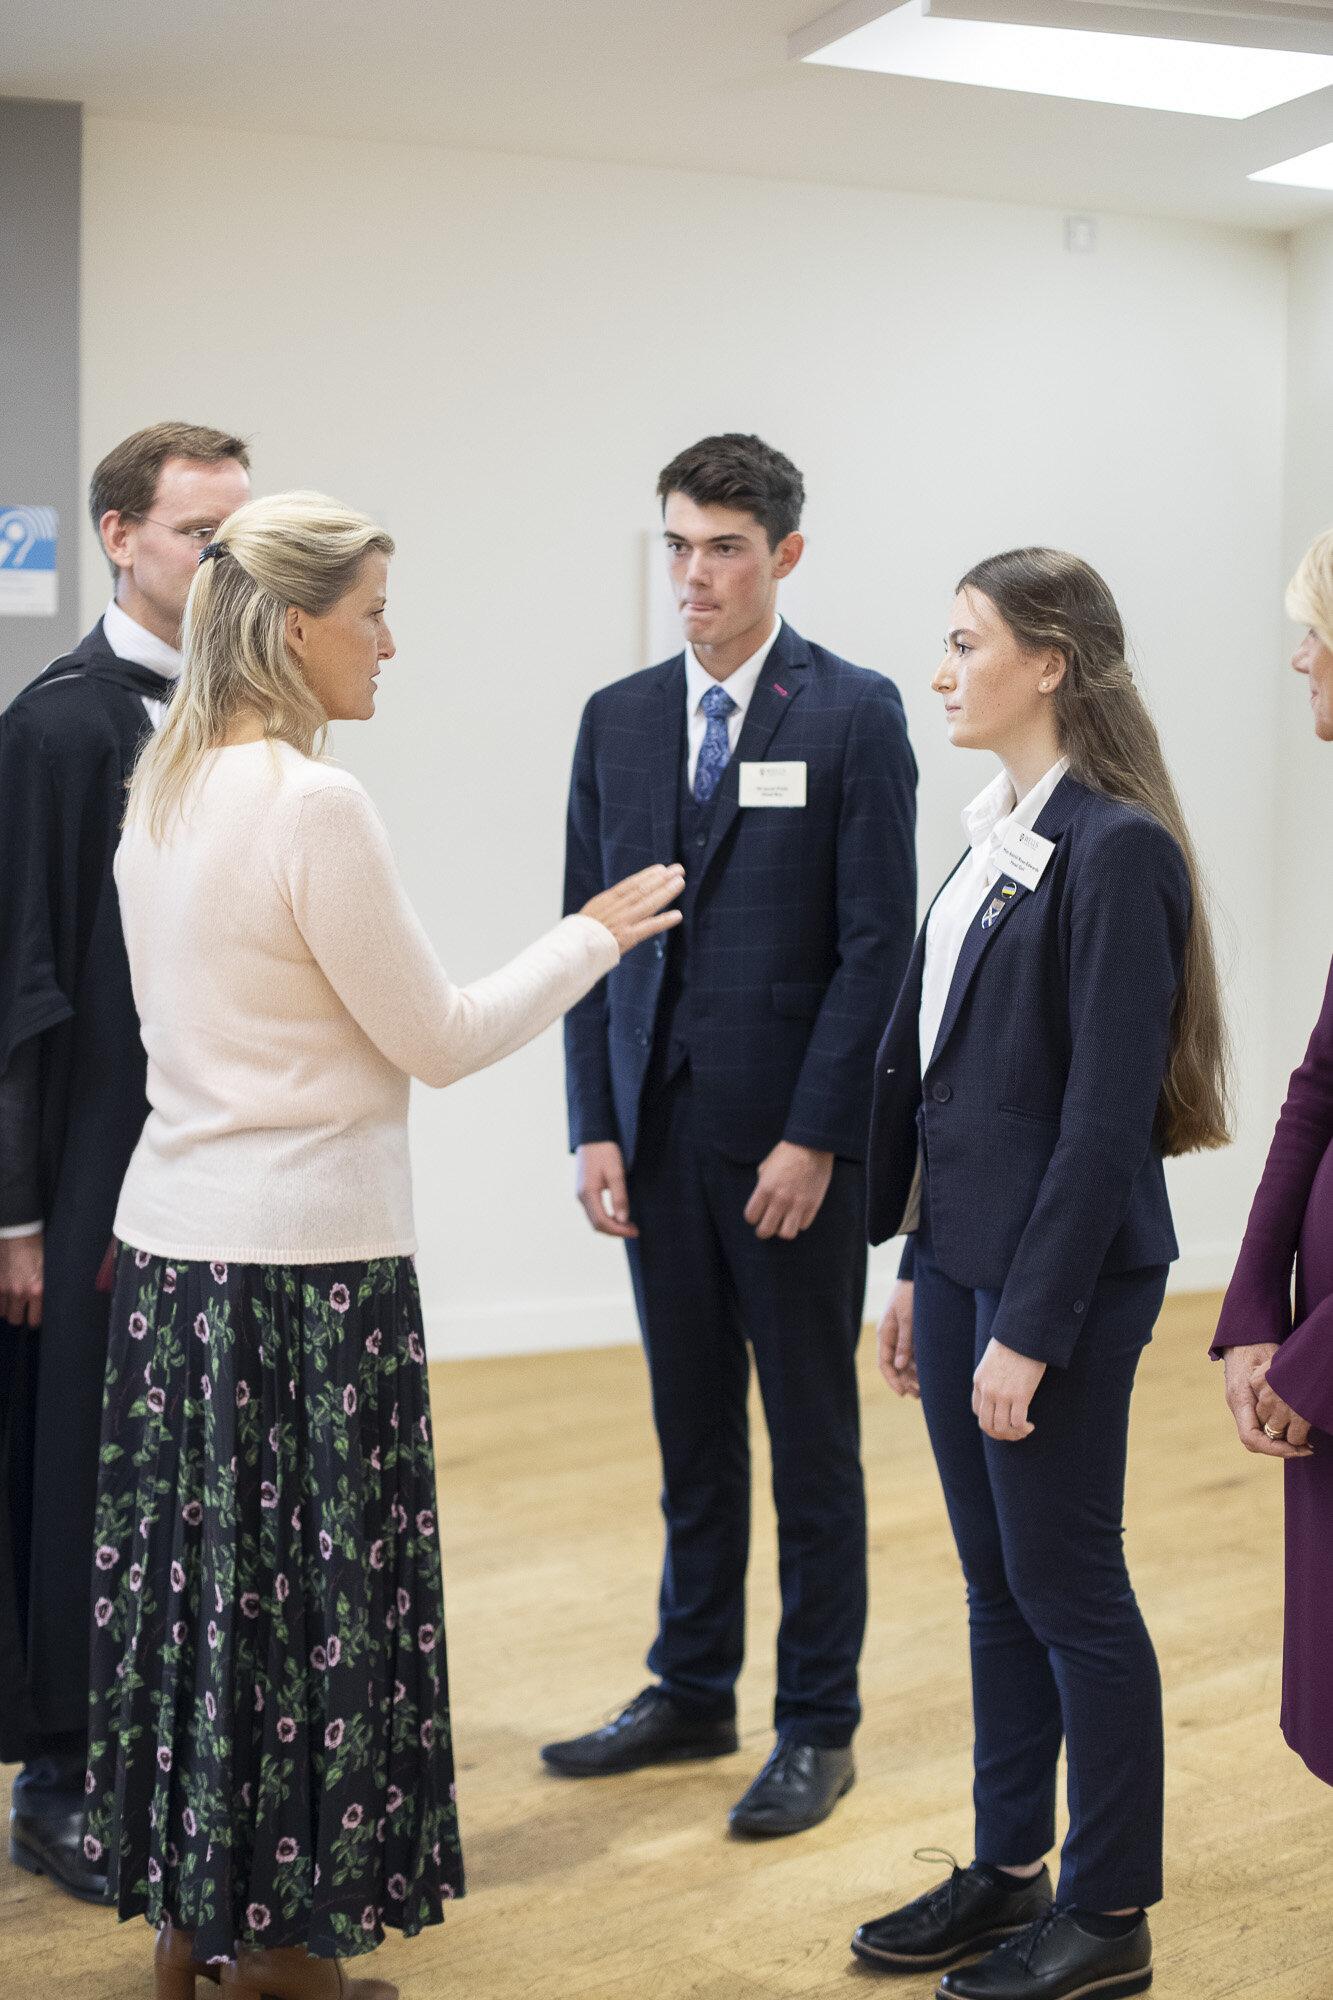 The Cathedral School's Head Boy, Jacob, and Head Girl, Astrid (a former Head Girl Chorister) meet HRH